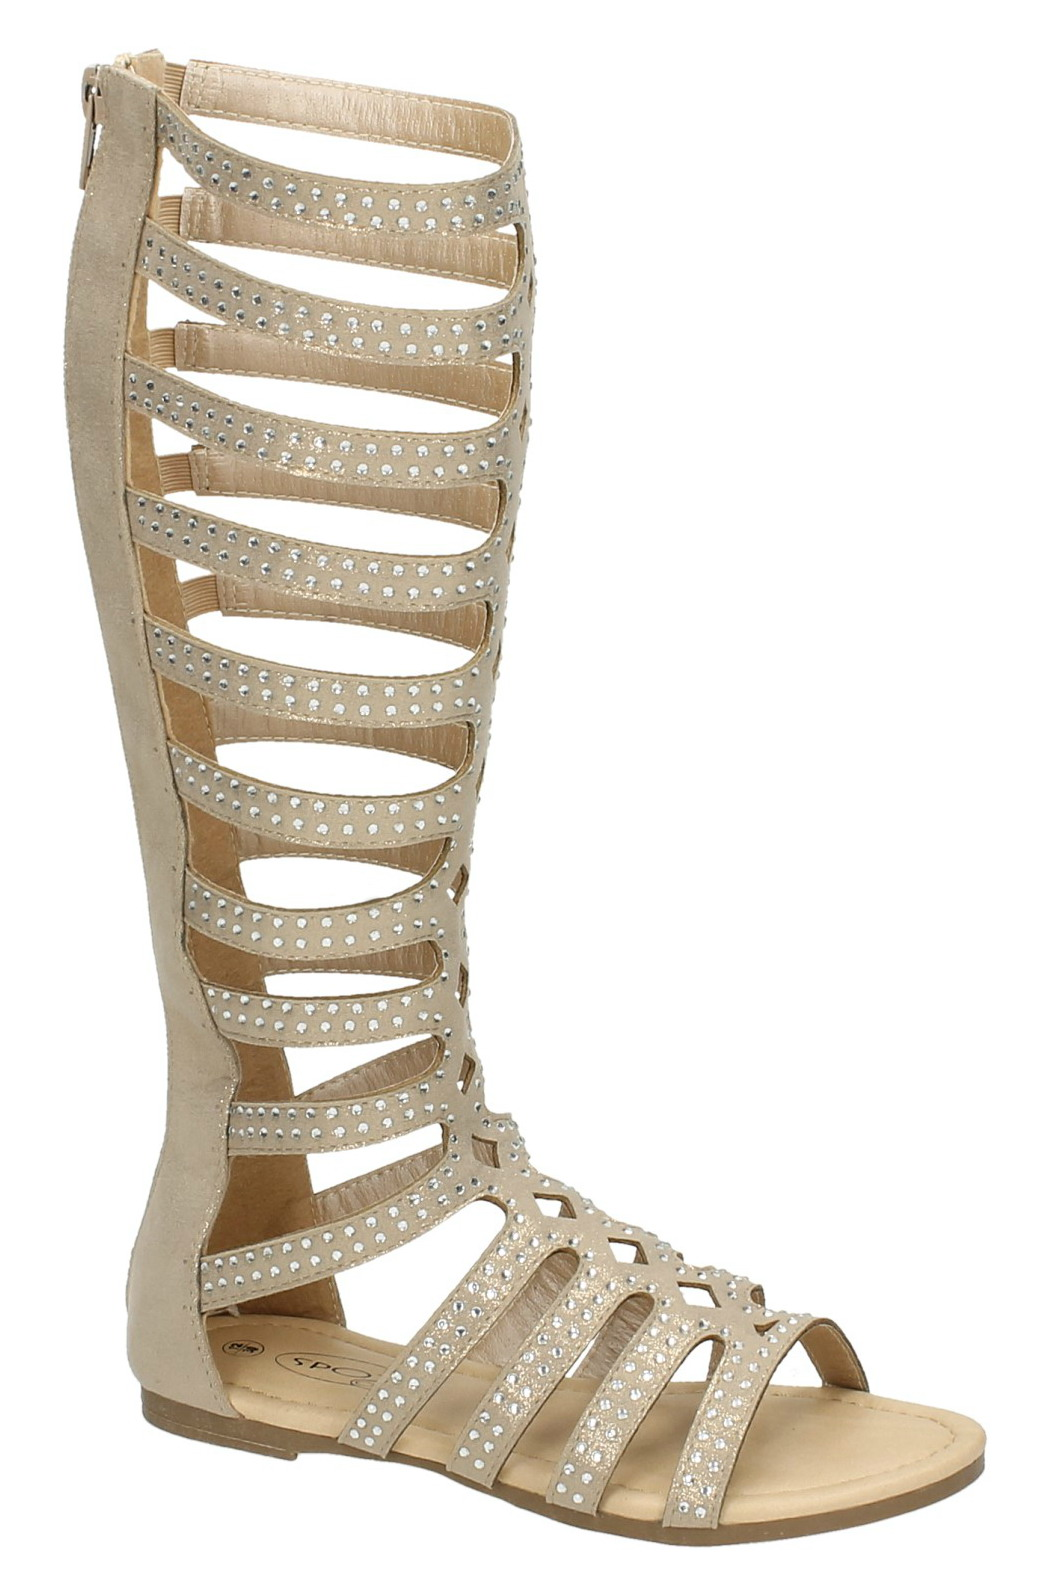 d110ff83e97 Girls Tall Knee High Strappy Gladiator Sandals Flat Diamante Summer ...